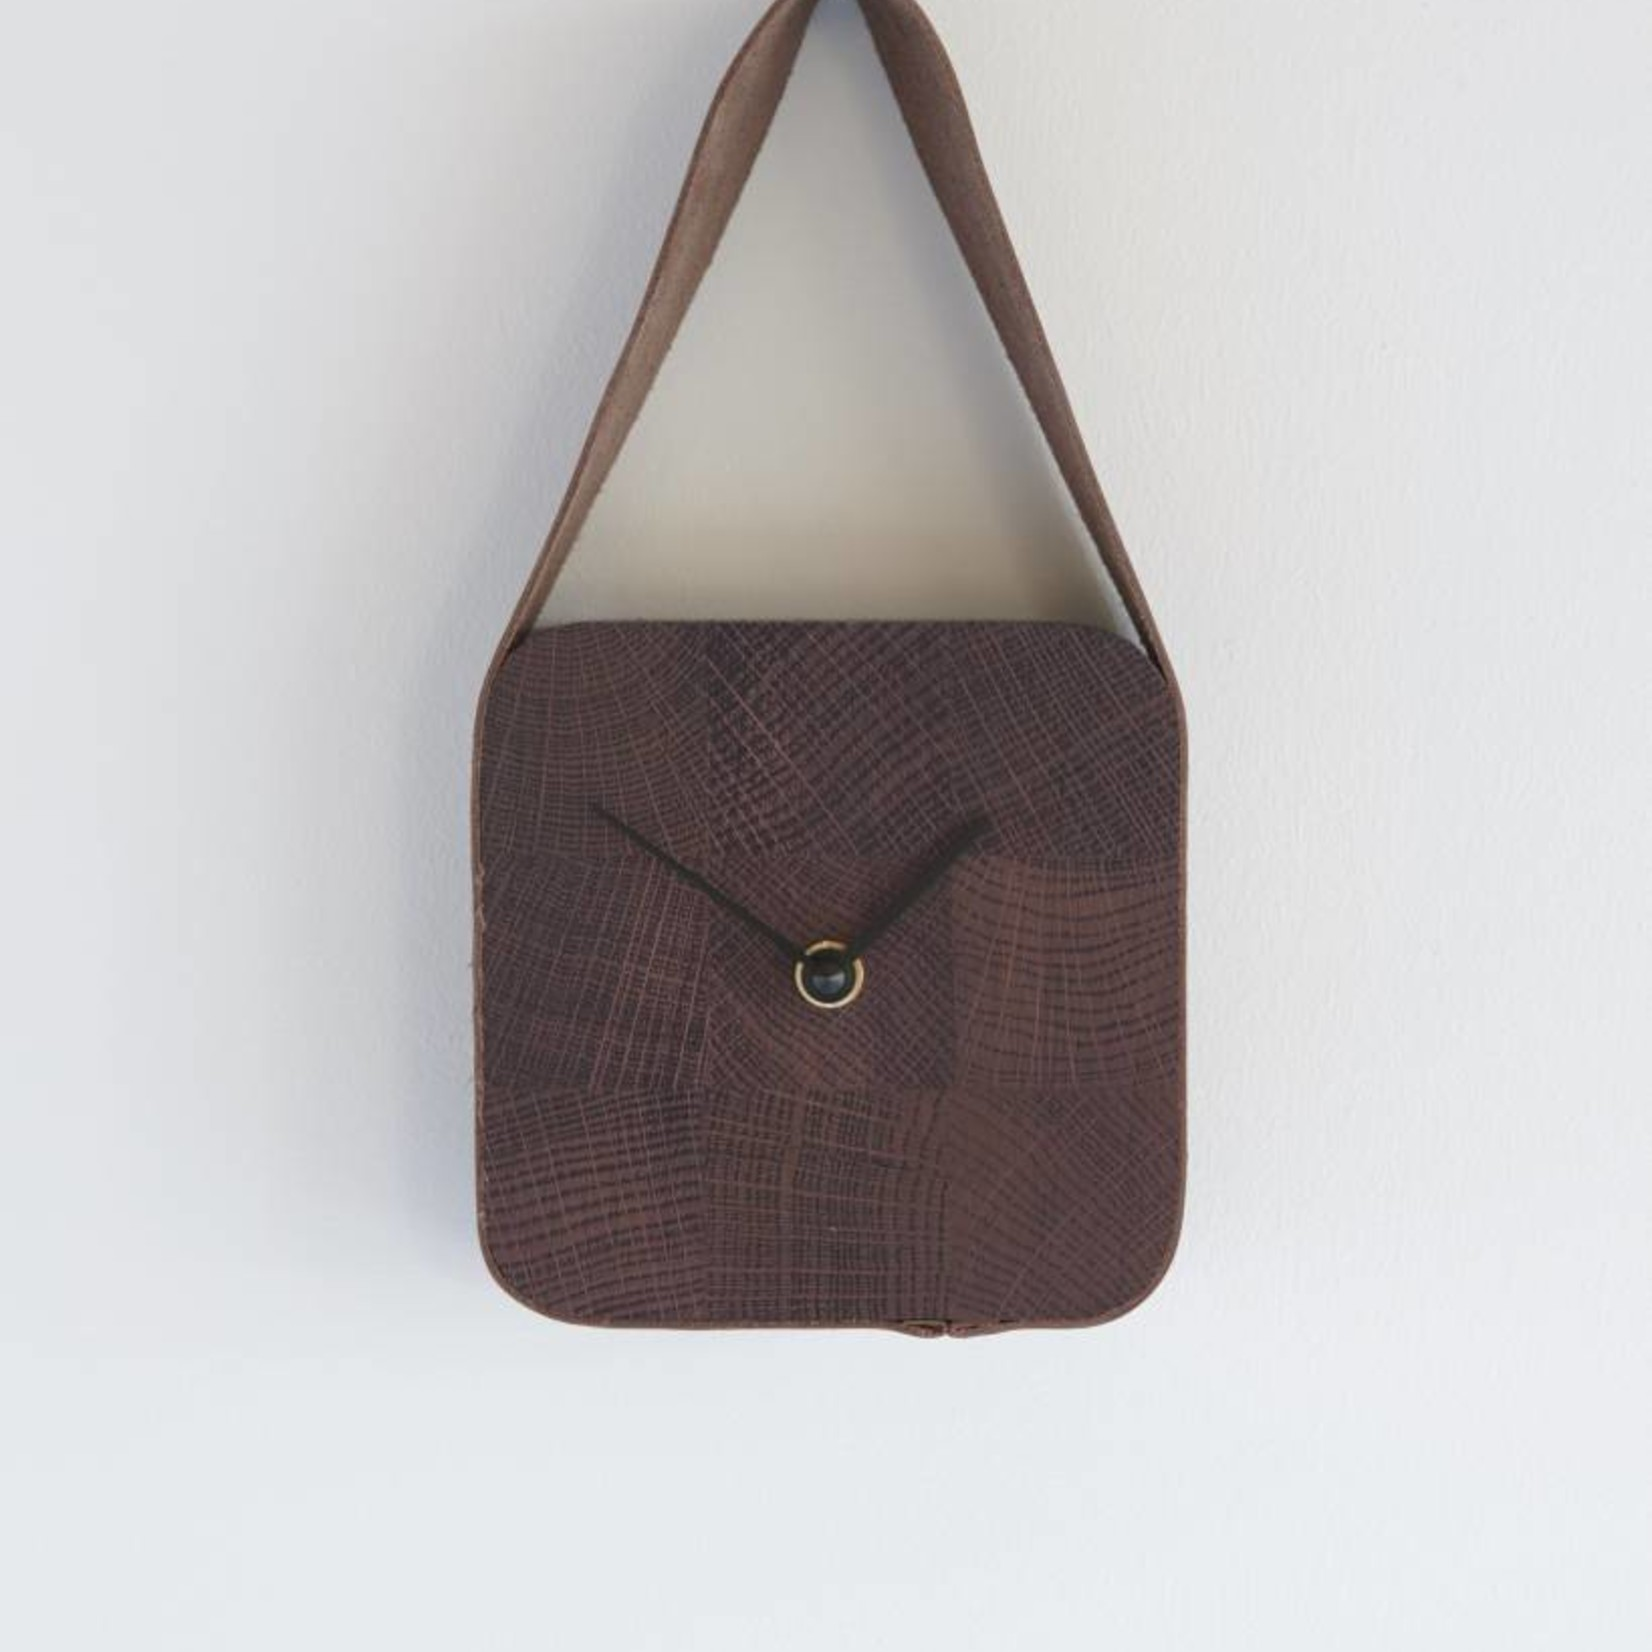 LABEL | Vandenberg Look Klok (vierkant) - Nova Zembla Acorn &  Deep Purper hout